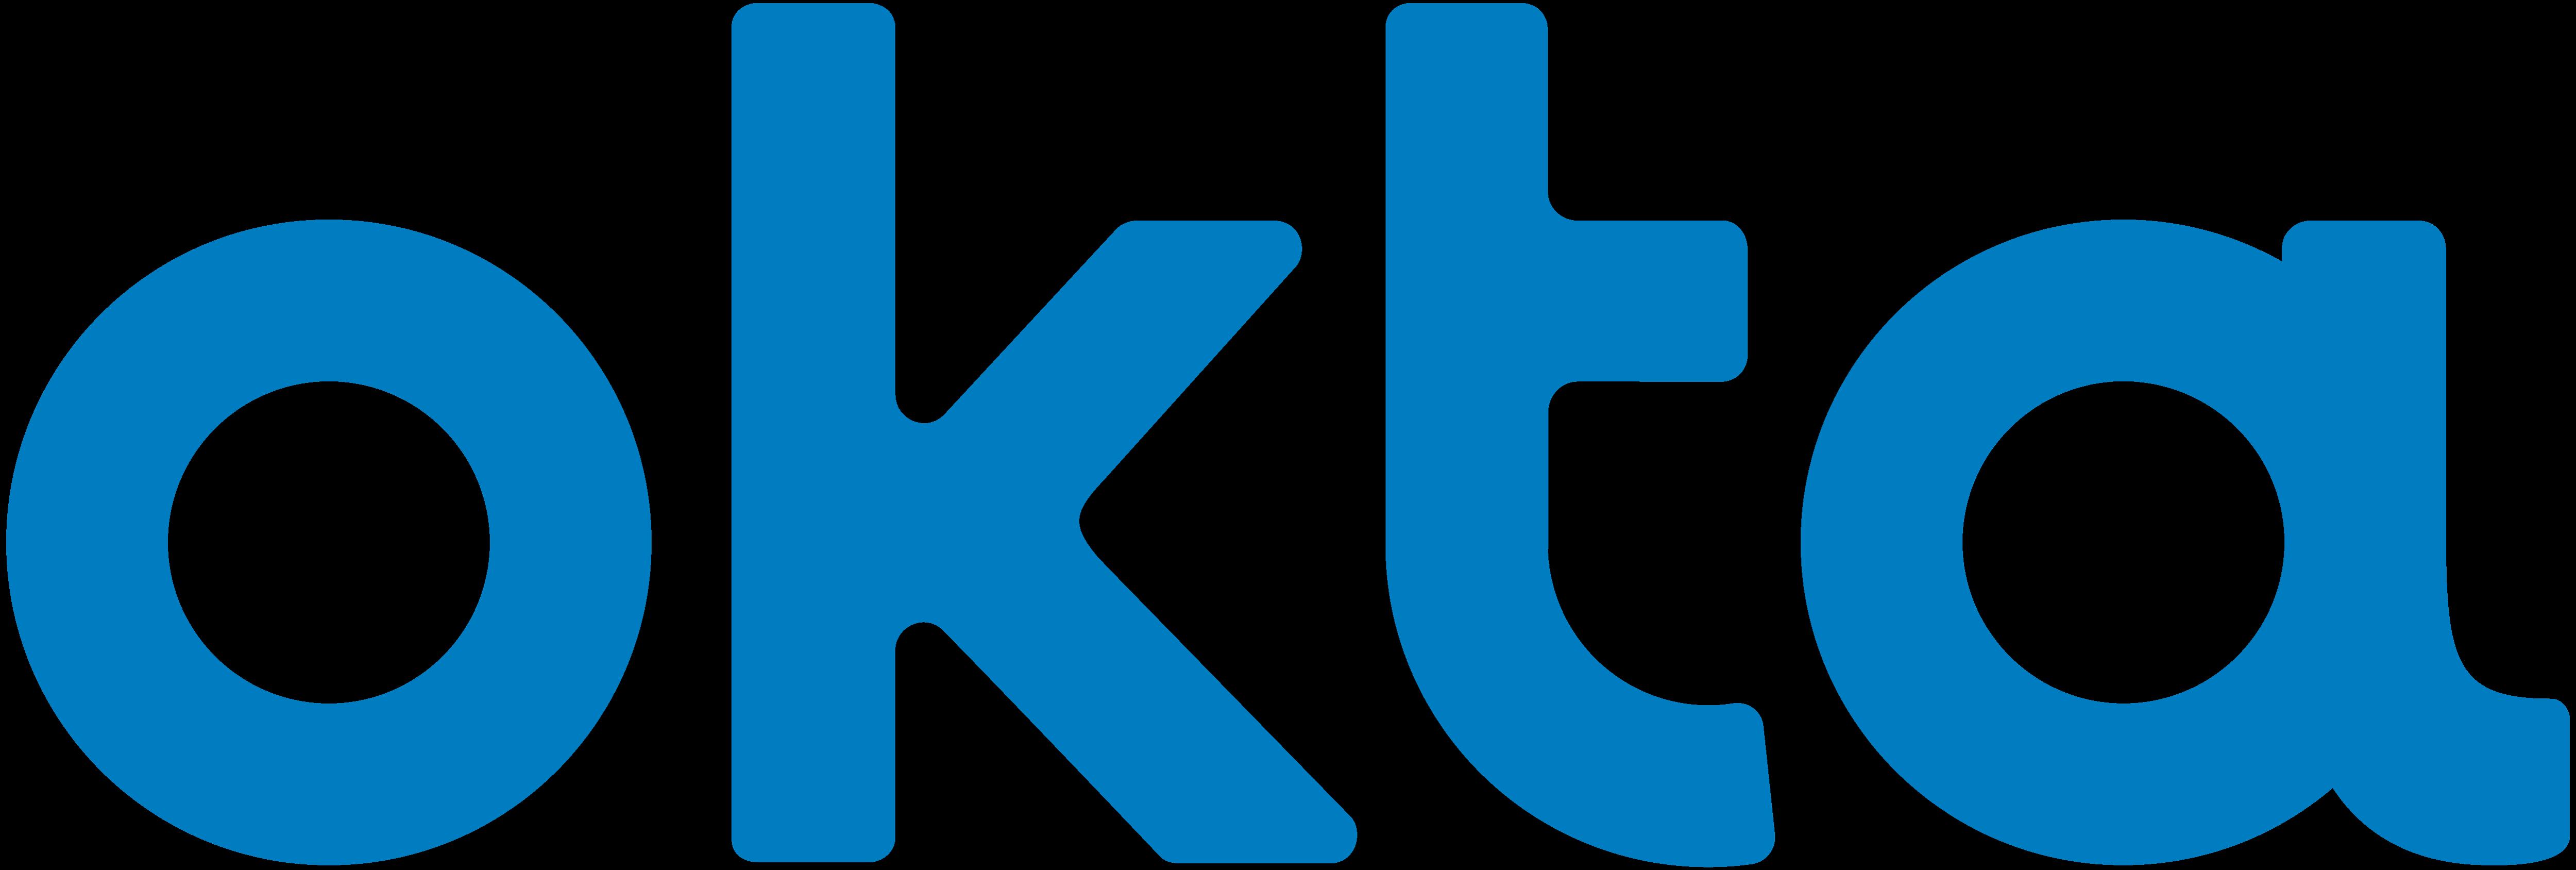 Okta_Logo_BrightBlue_Large